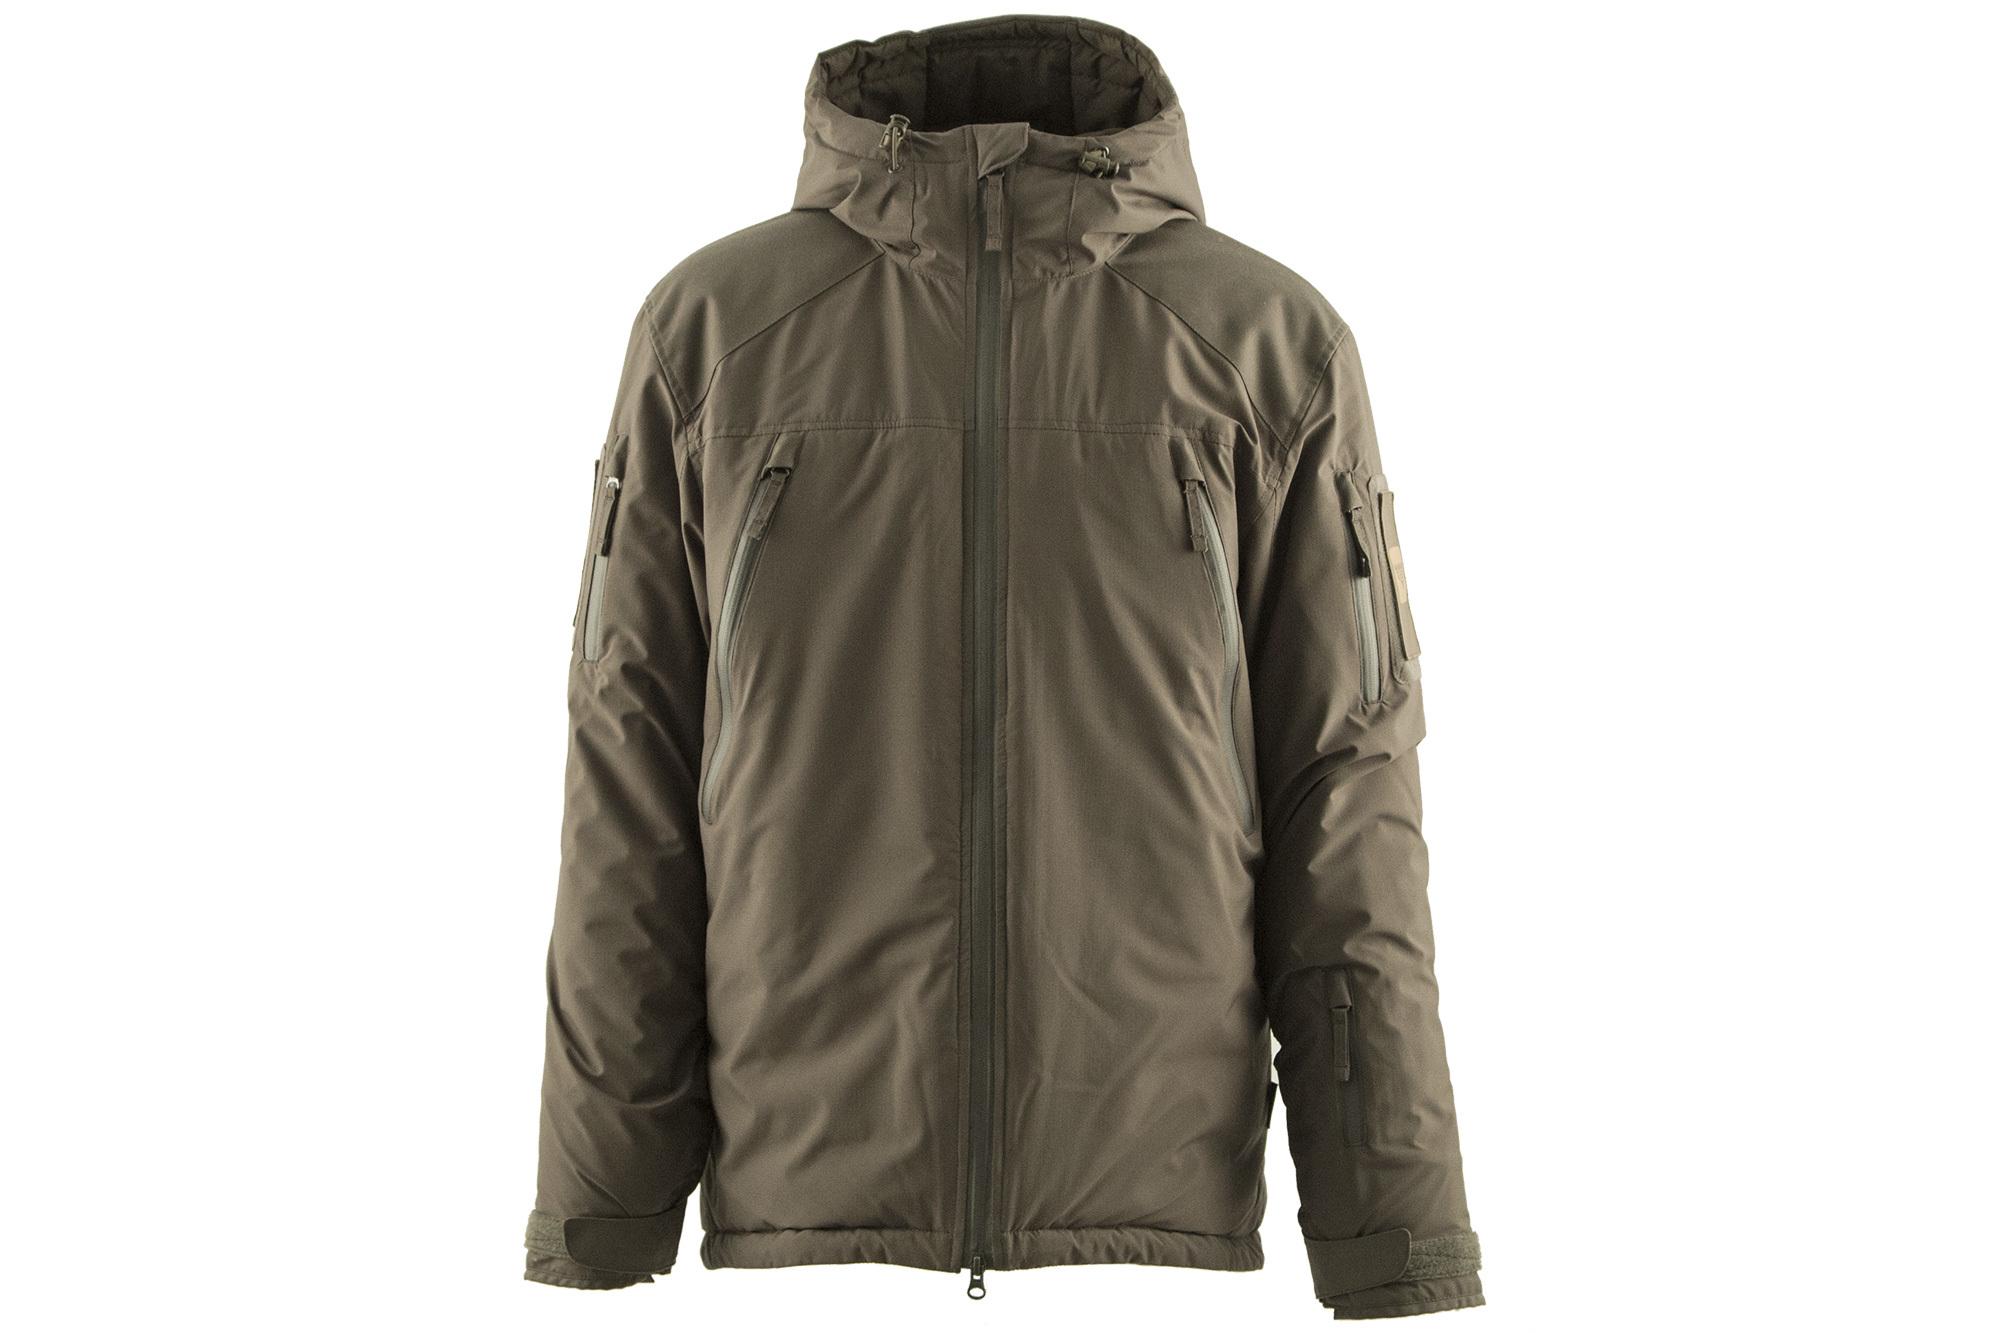 Куртка Carinthia Mig 3.0 Jacket